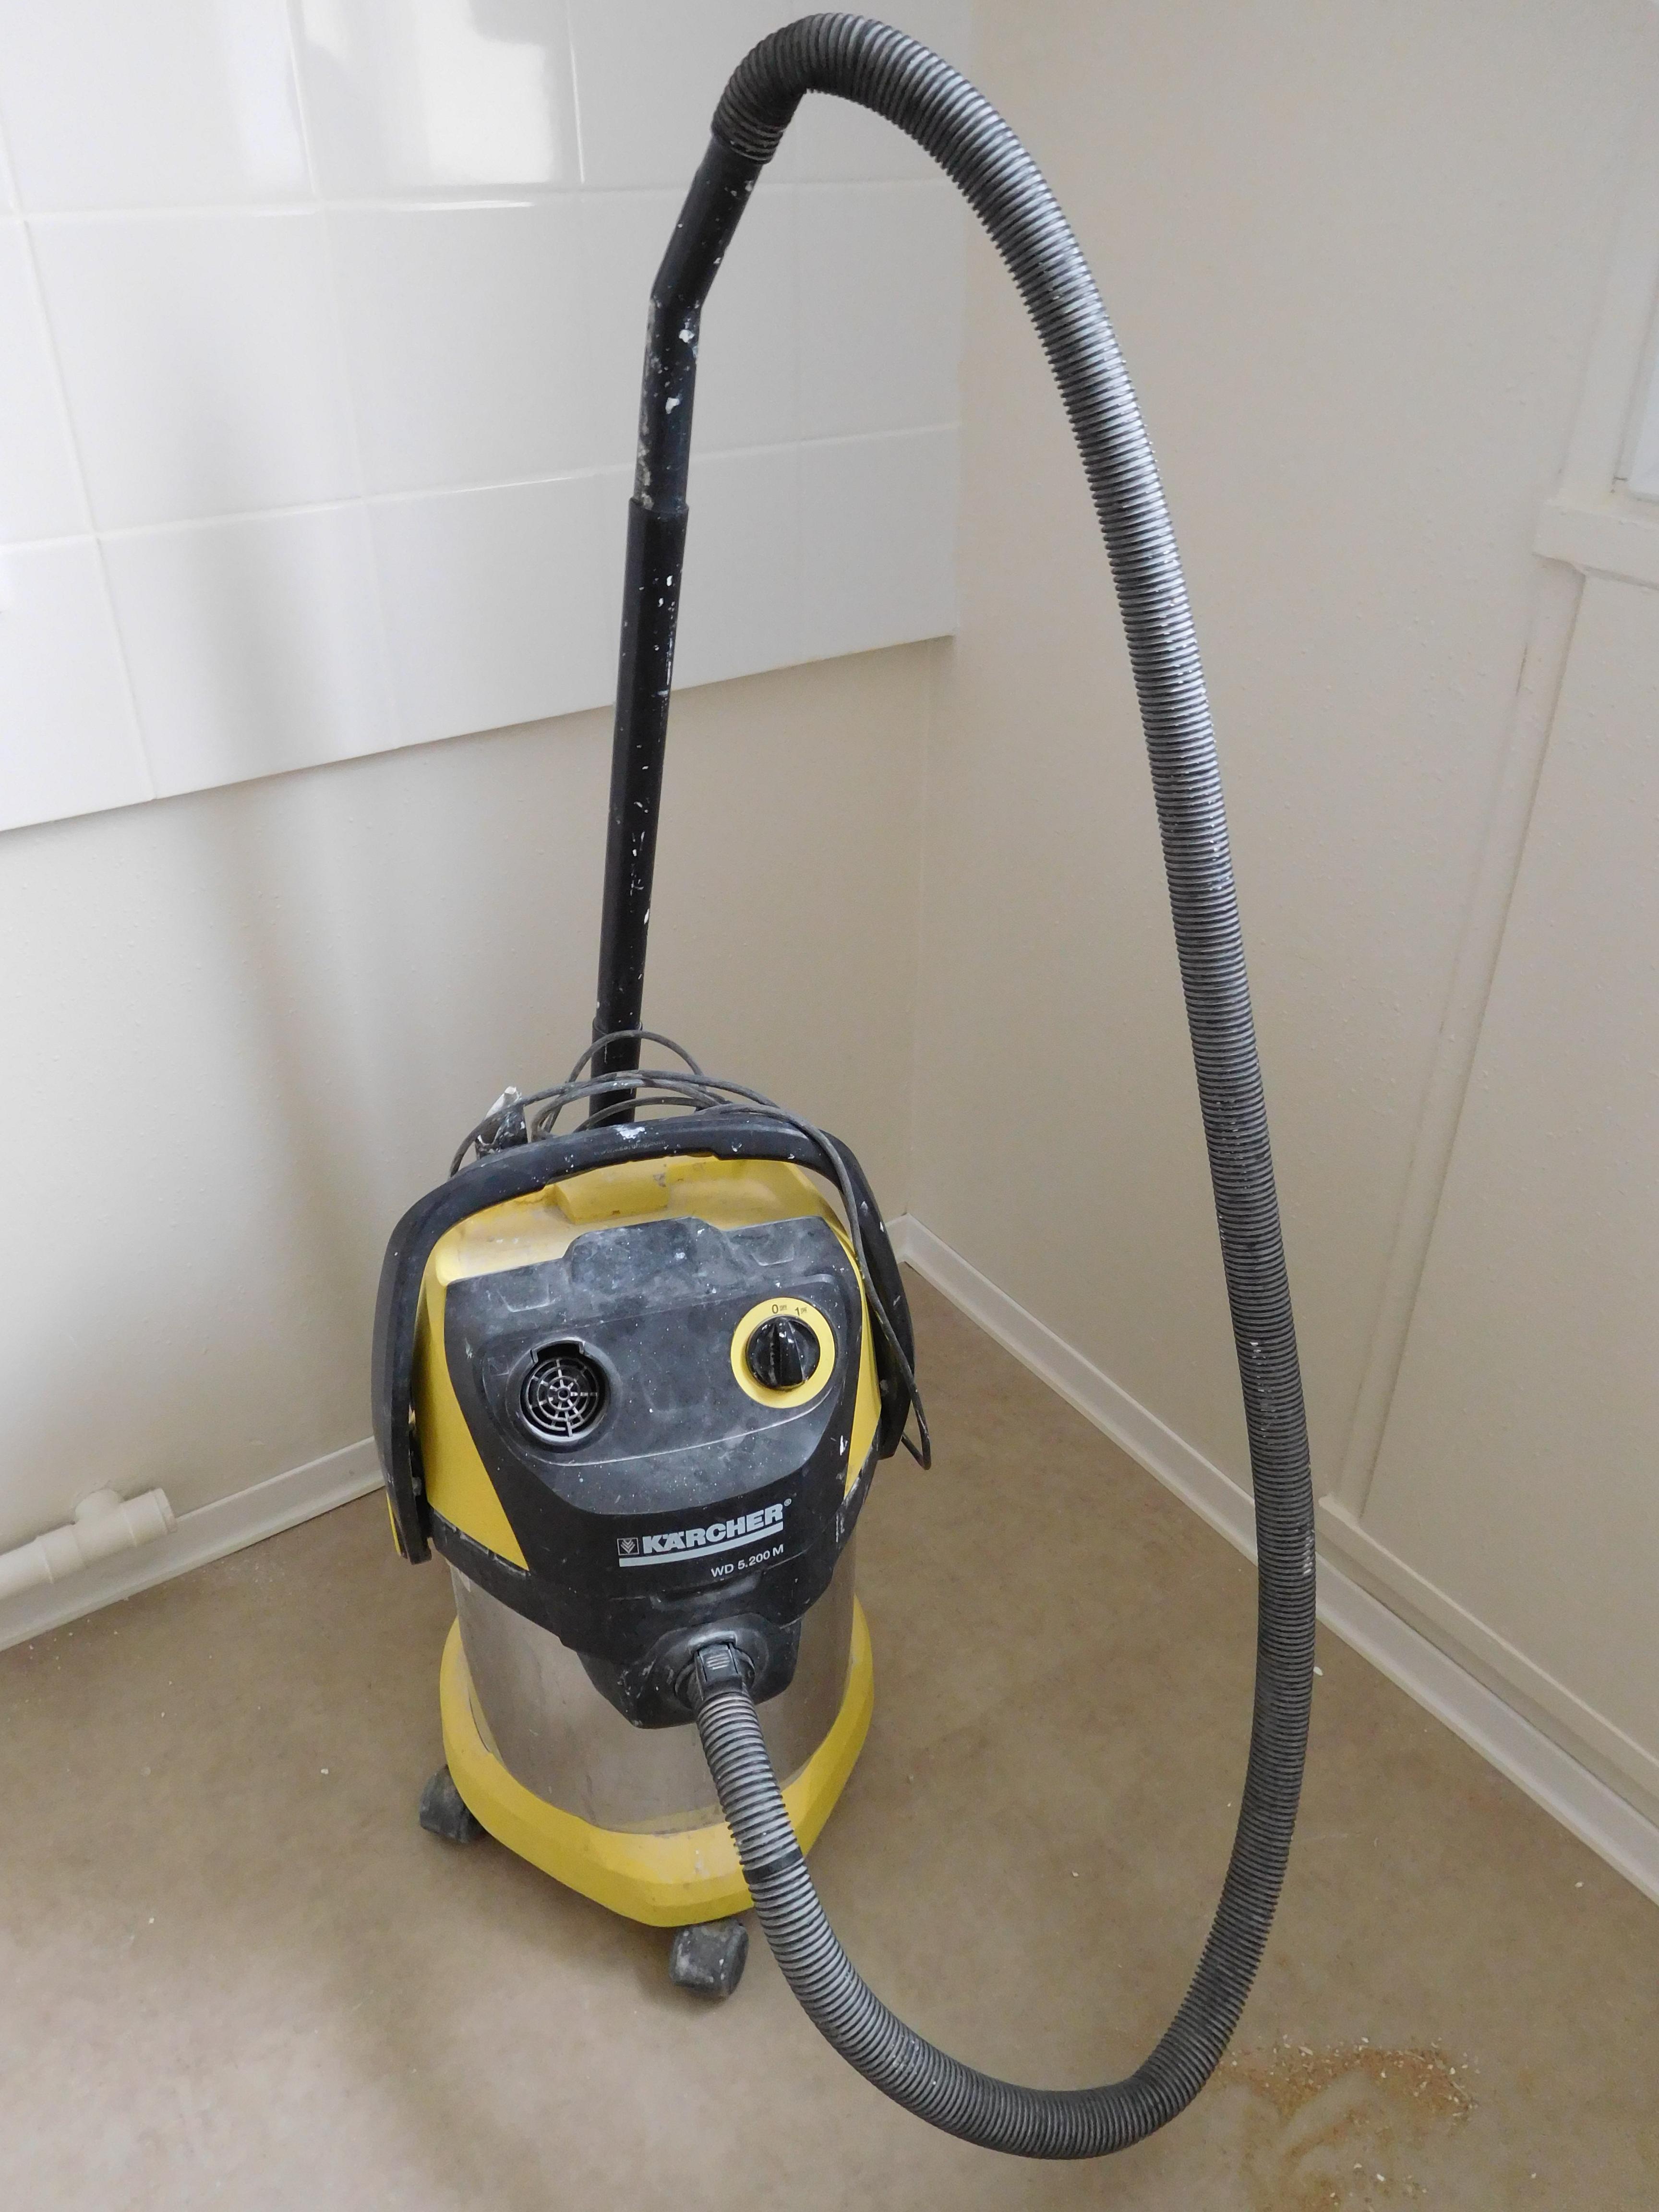 Filekrcher Wd 5201 M Vacuum Cleaner Front View Wikimedia Karcher 2